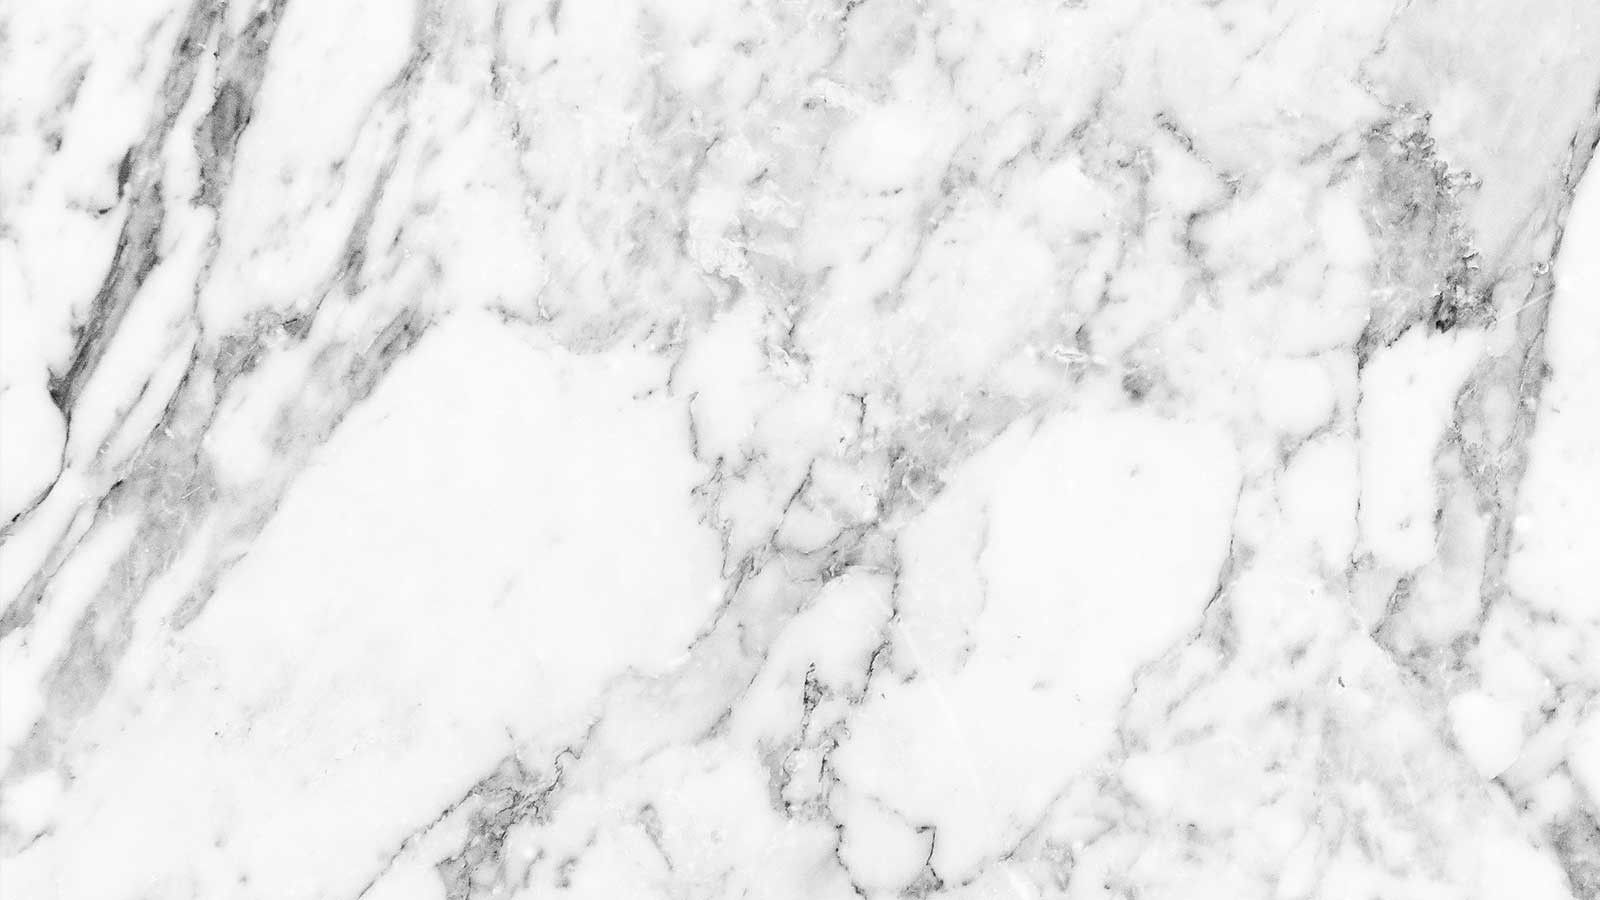 White Marble Desktop Wallpapers Top Free White Marble Desktop